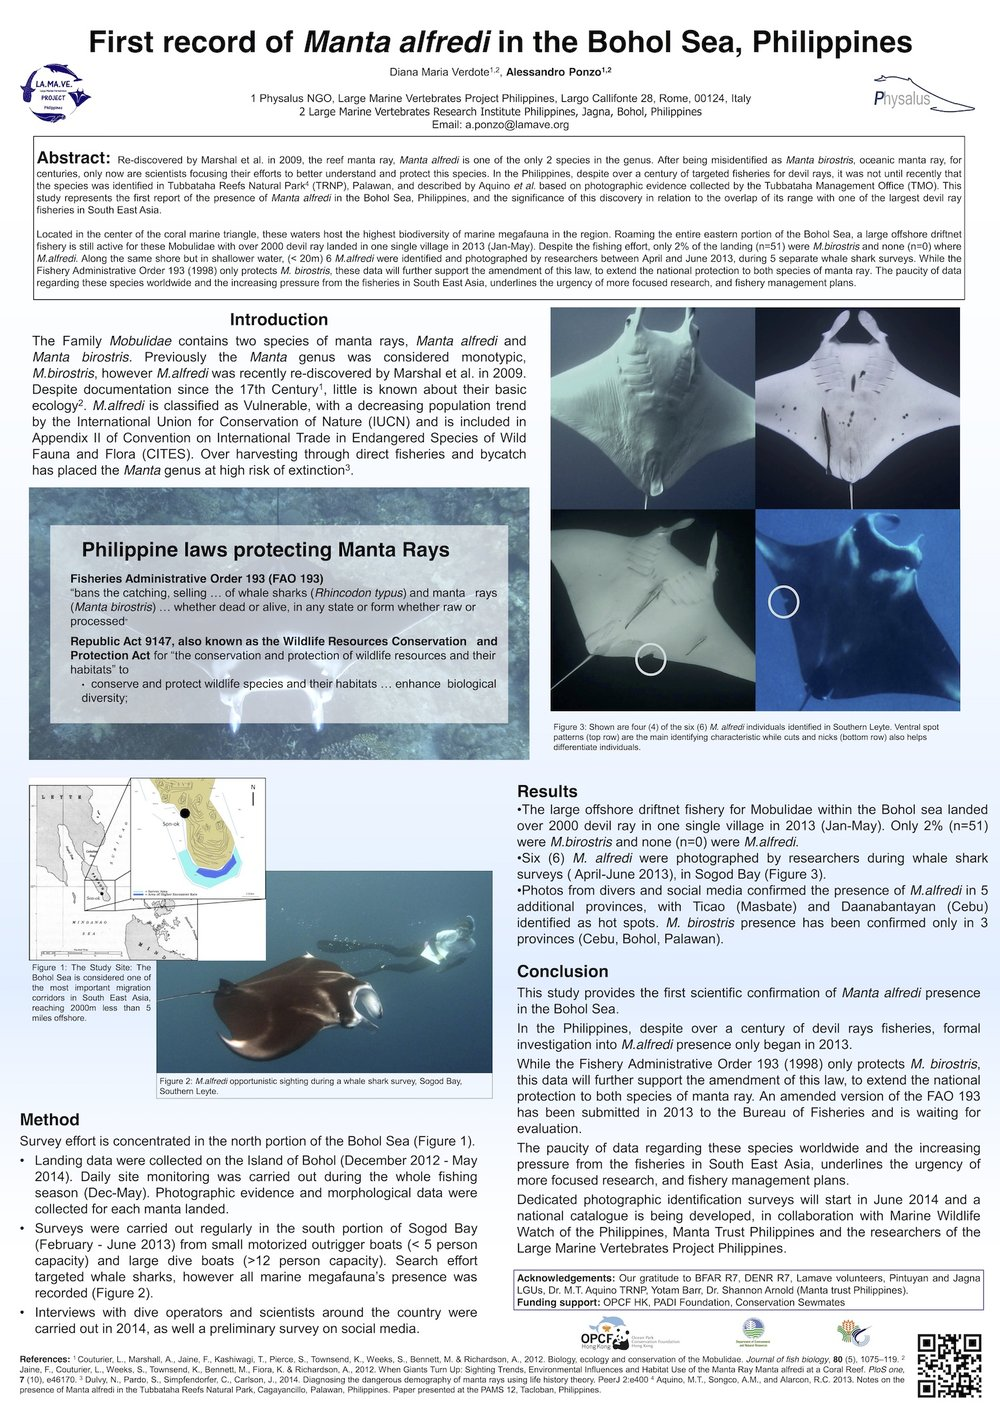 Ponzo_A.First-Record-of-Manta-Alfredi-in-the-Bohol-Sea.jpeg